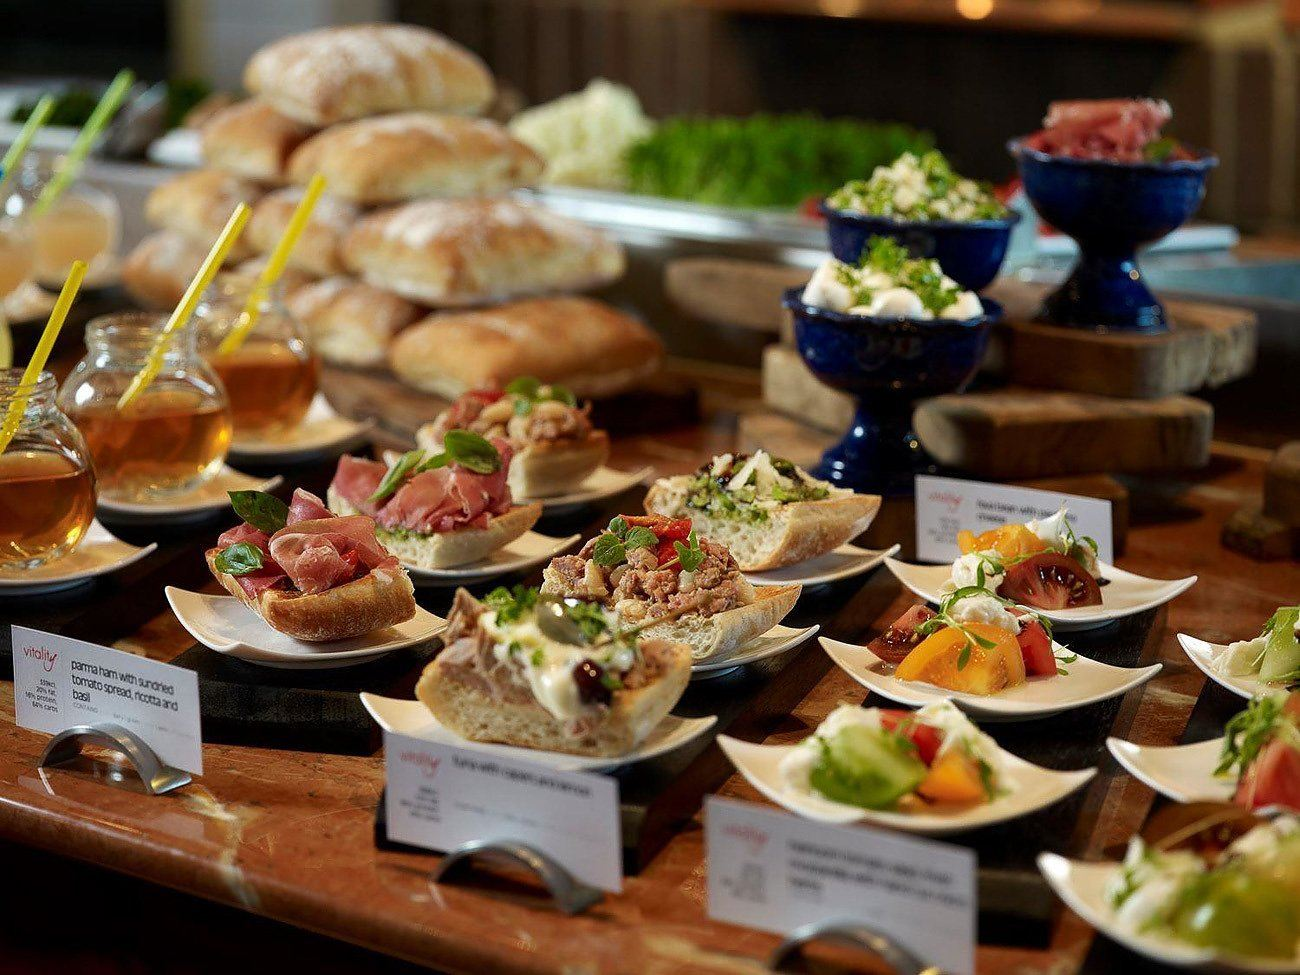 Healthy menu choices from the Swissotel Vitality menu.